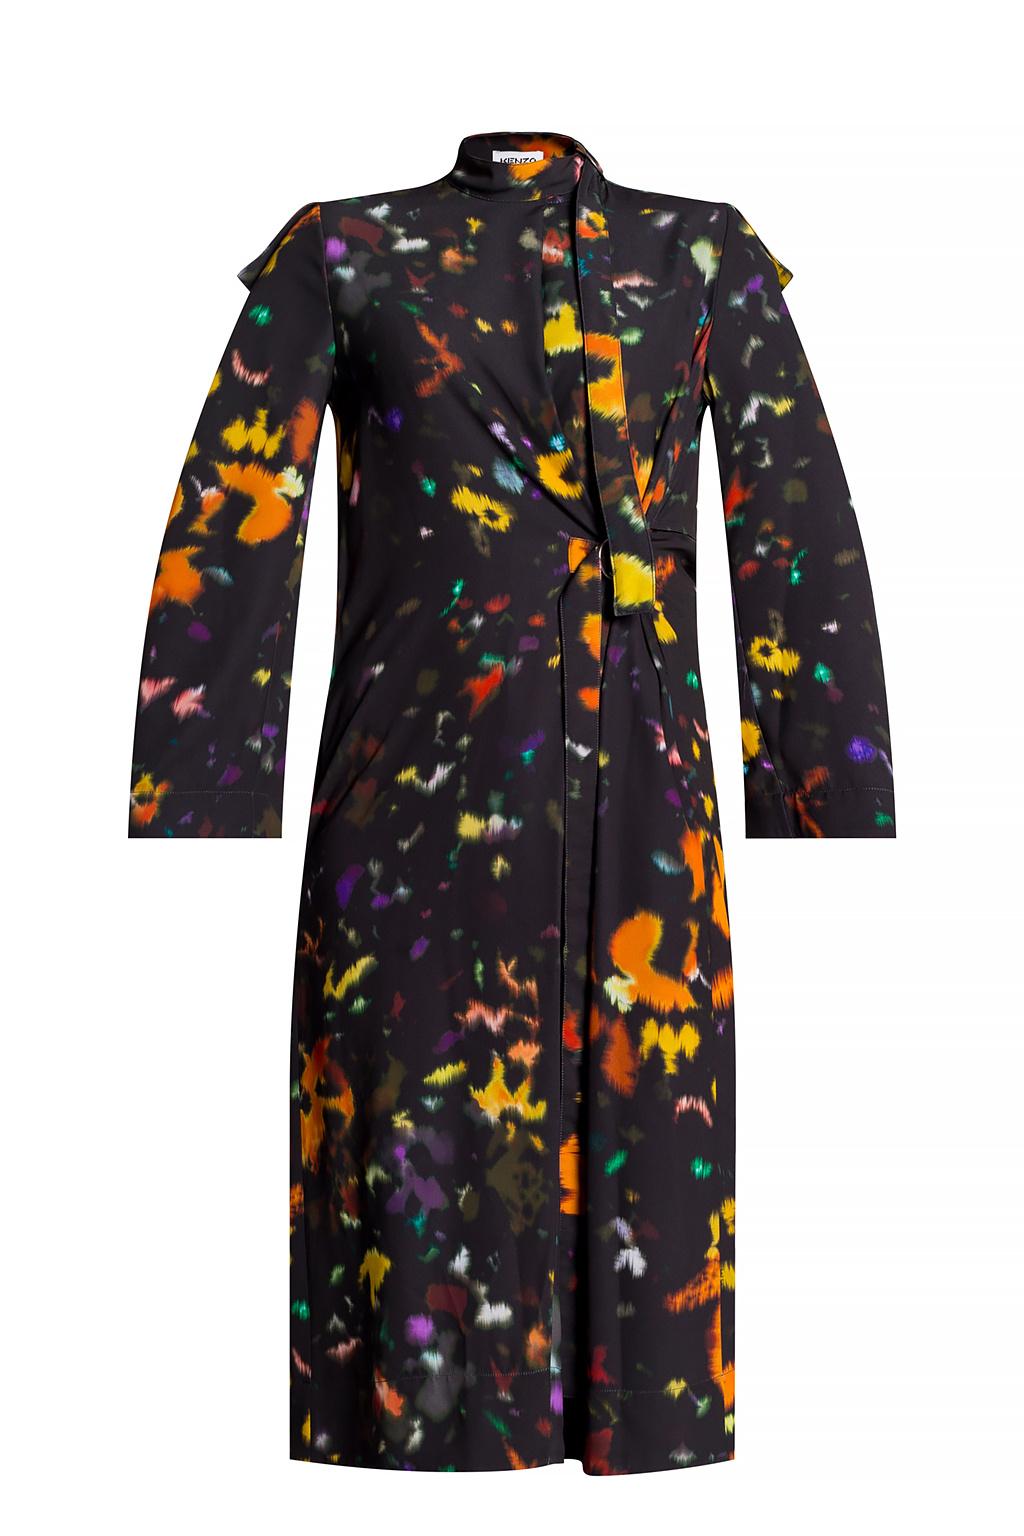 Kenzo Printed dress